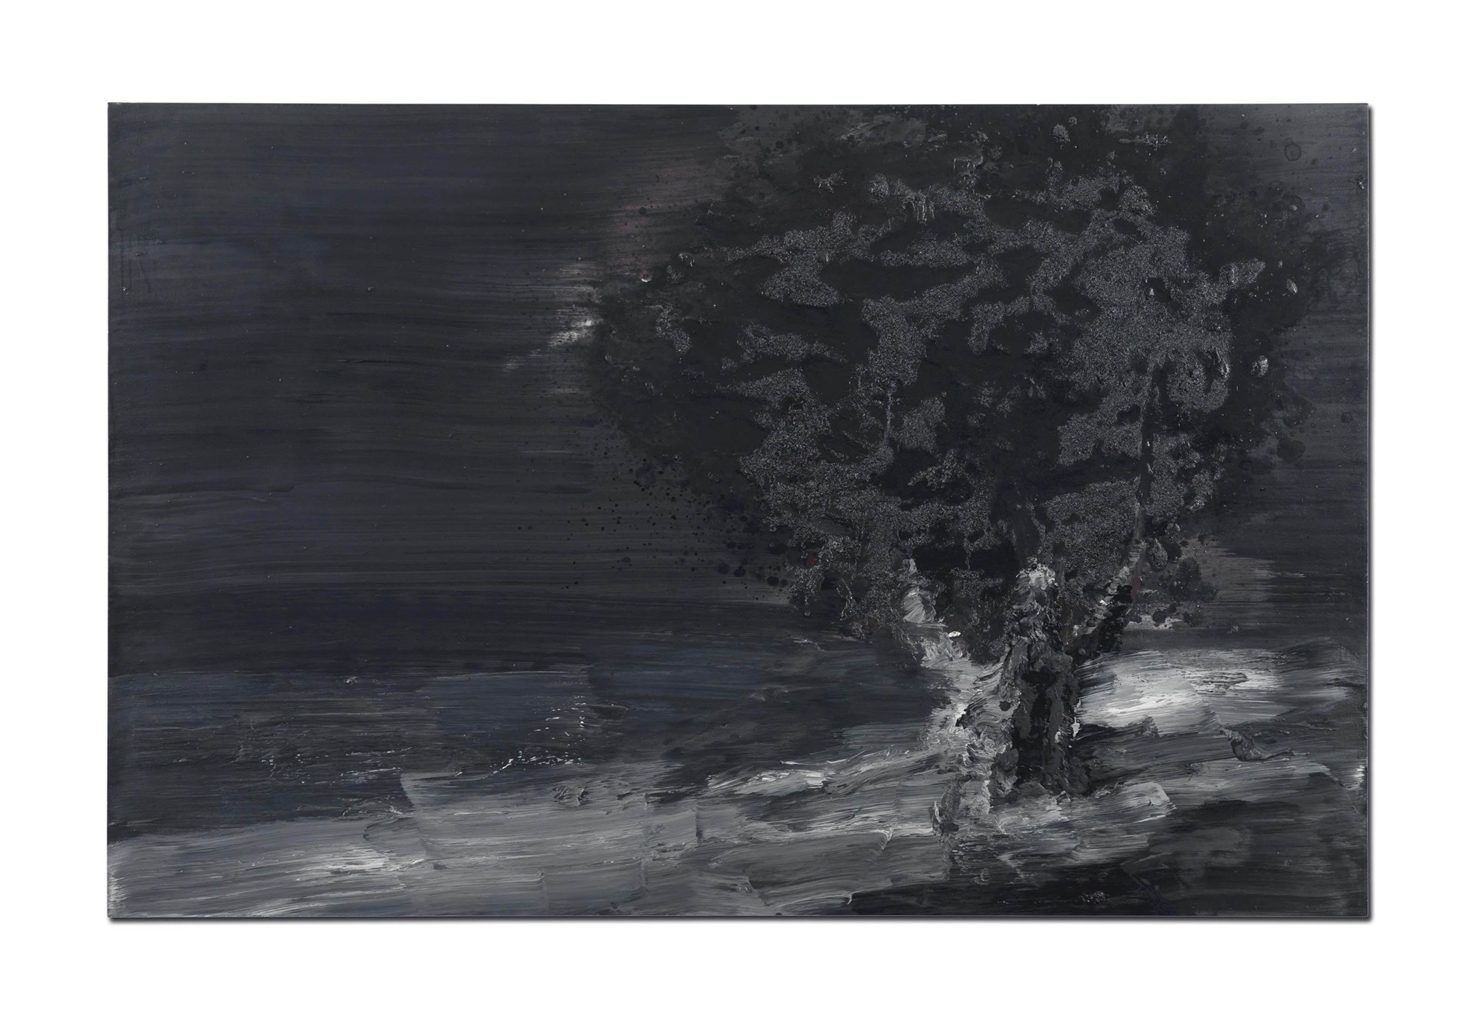 Yan Pei-Ming-International landscape-2003